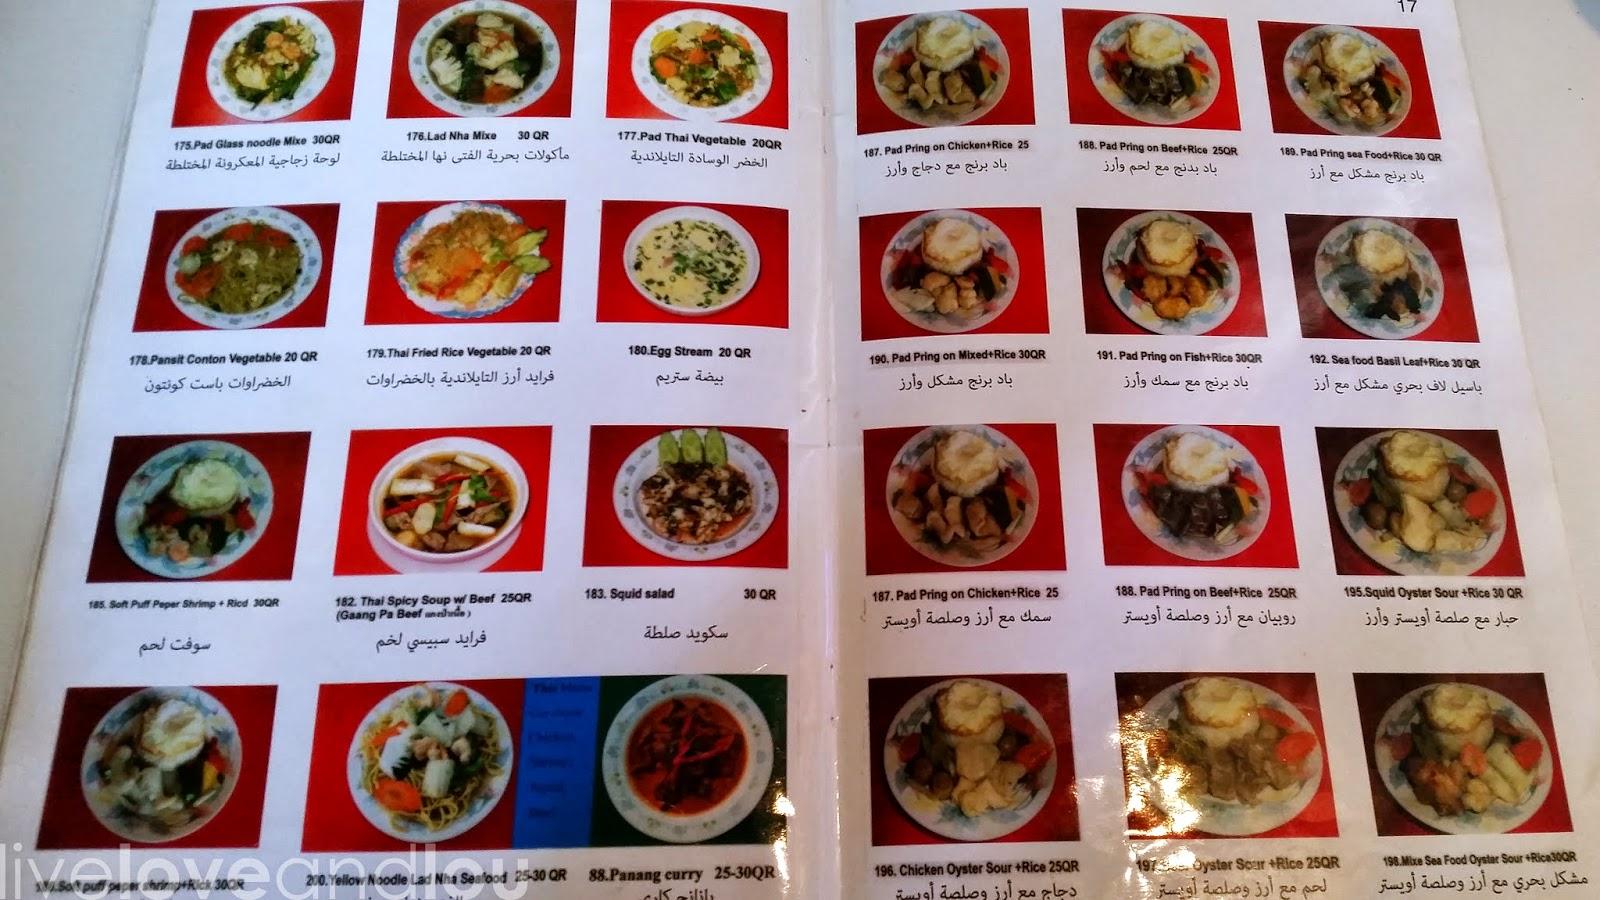 Thai Snack Restaurant Doha Menu